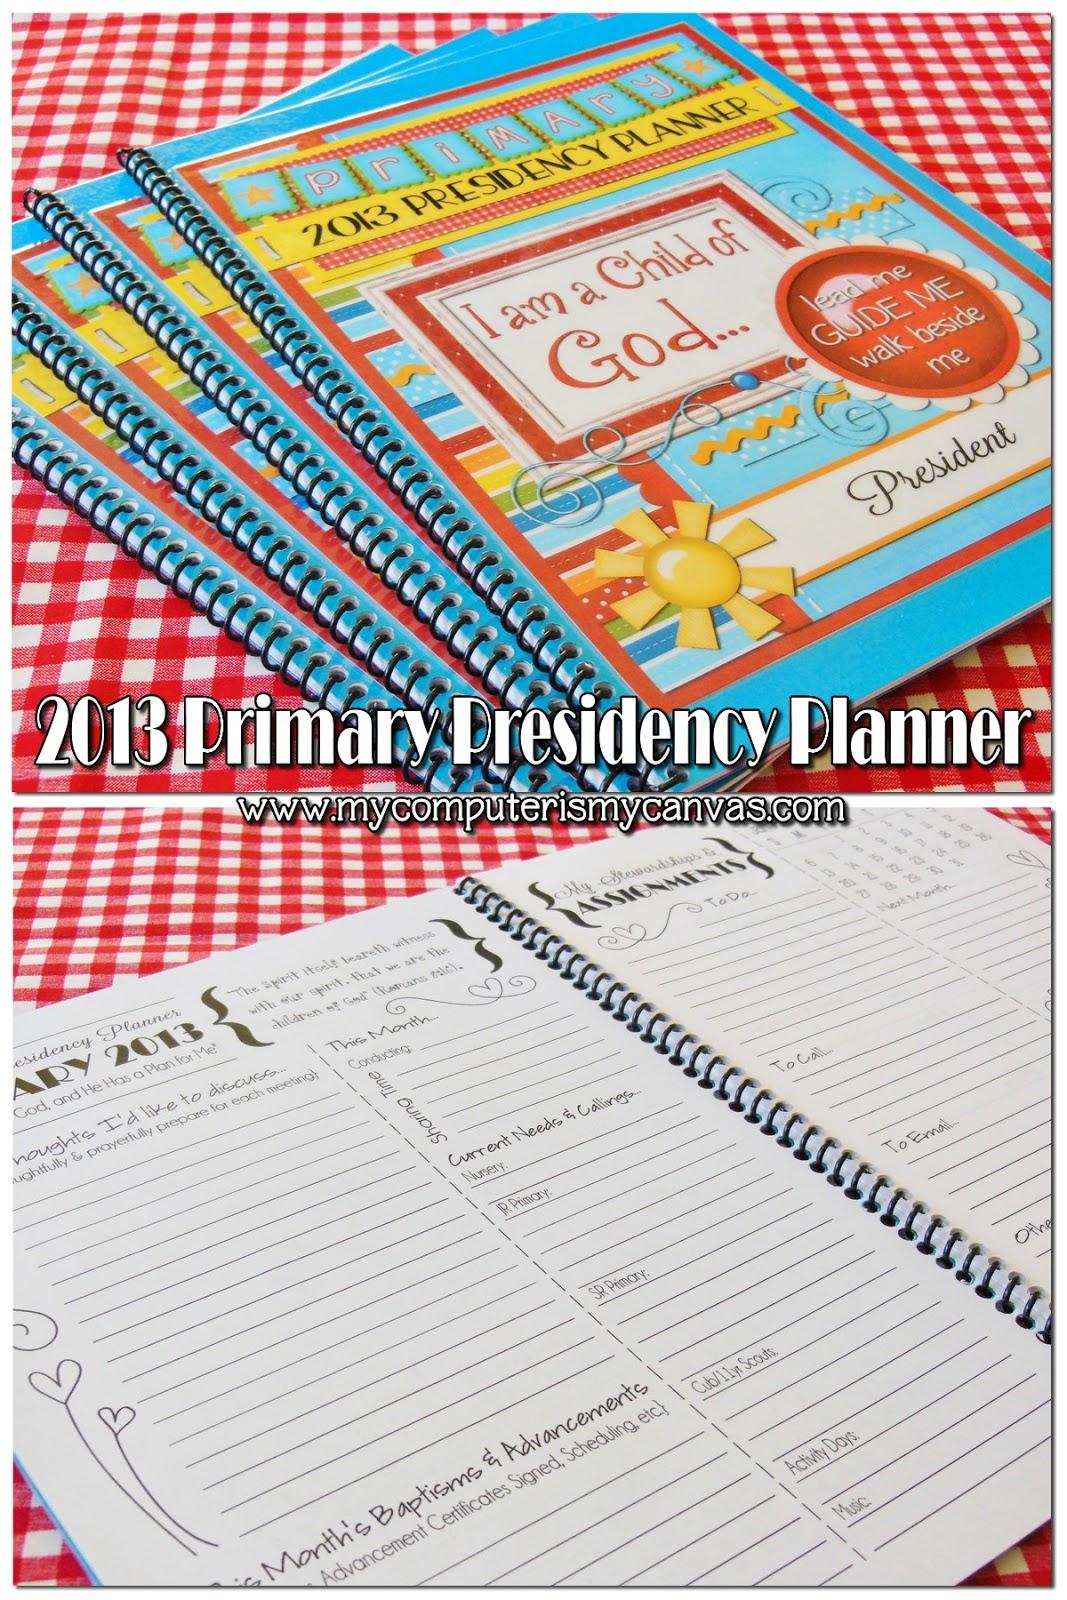 LDS 2013 planning calendar printable | just b.CAUSE